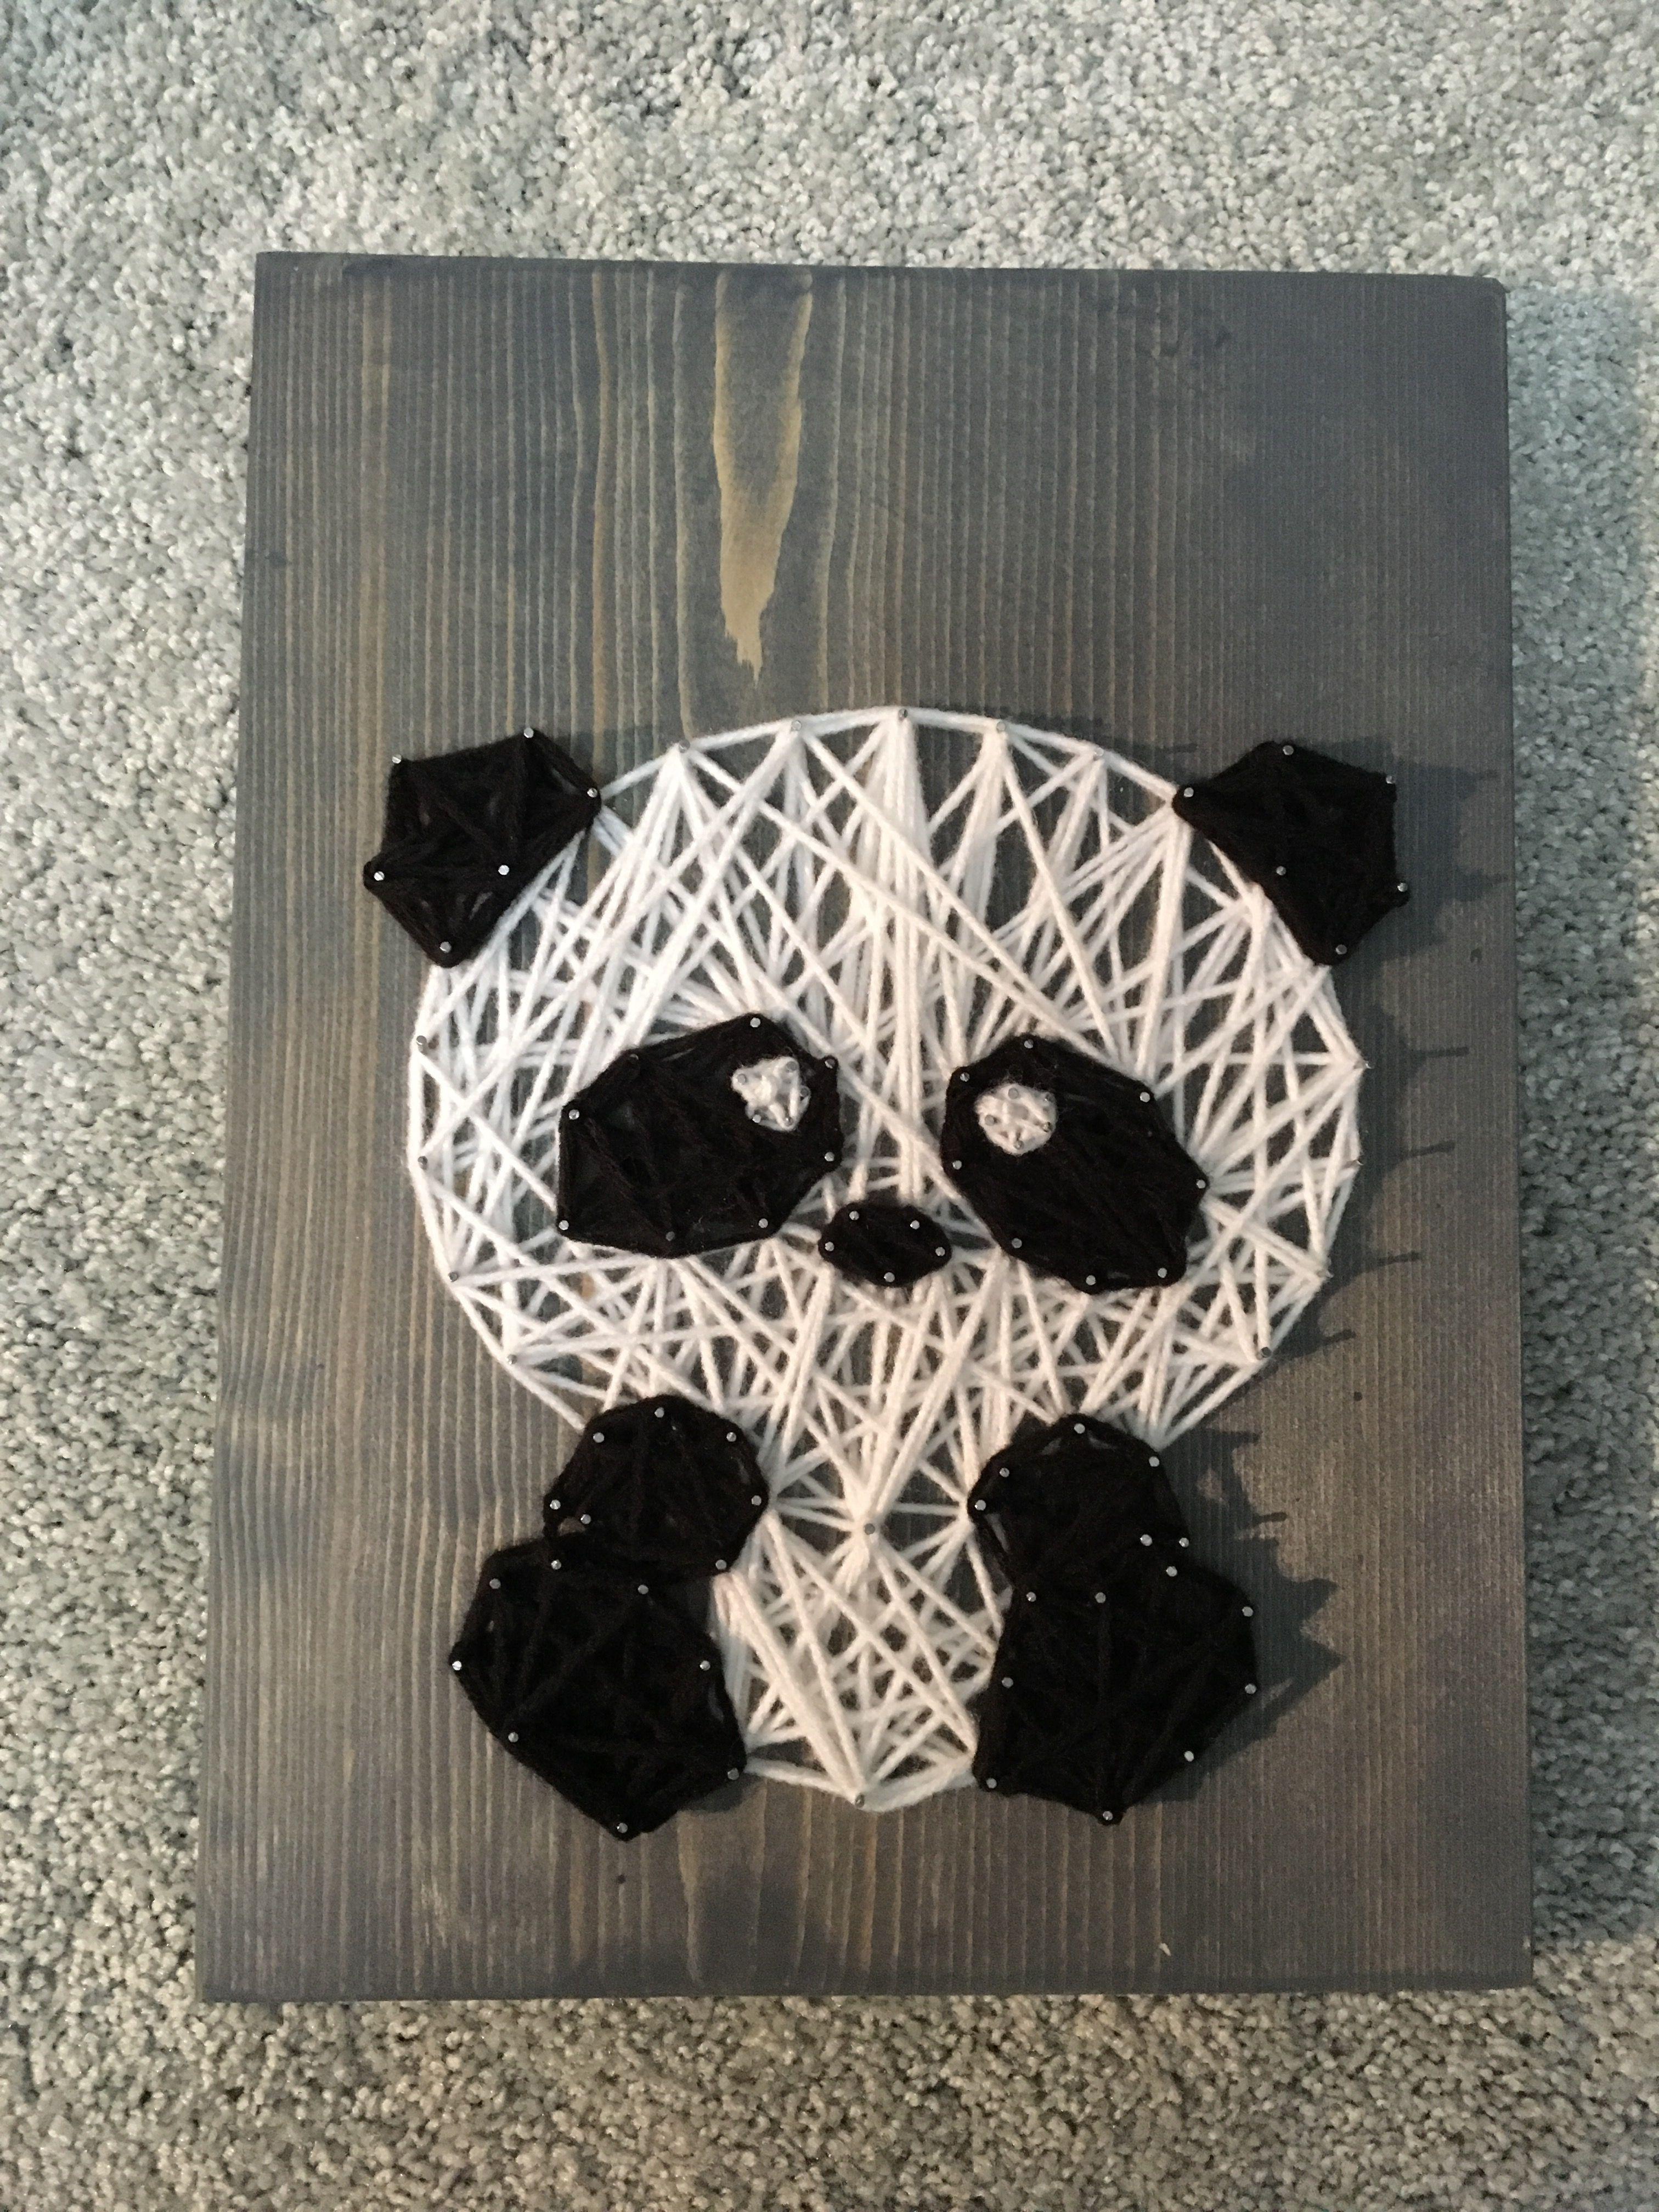 Diy String Art String Art On Pinterest String Art String Art Patterns And Diy